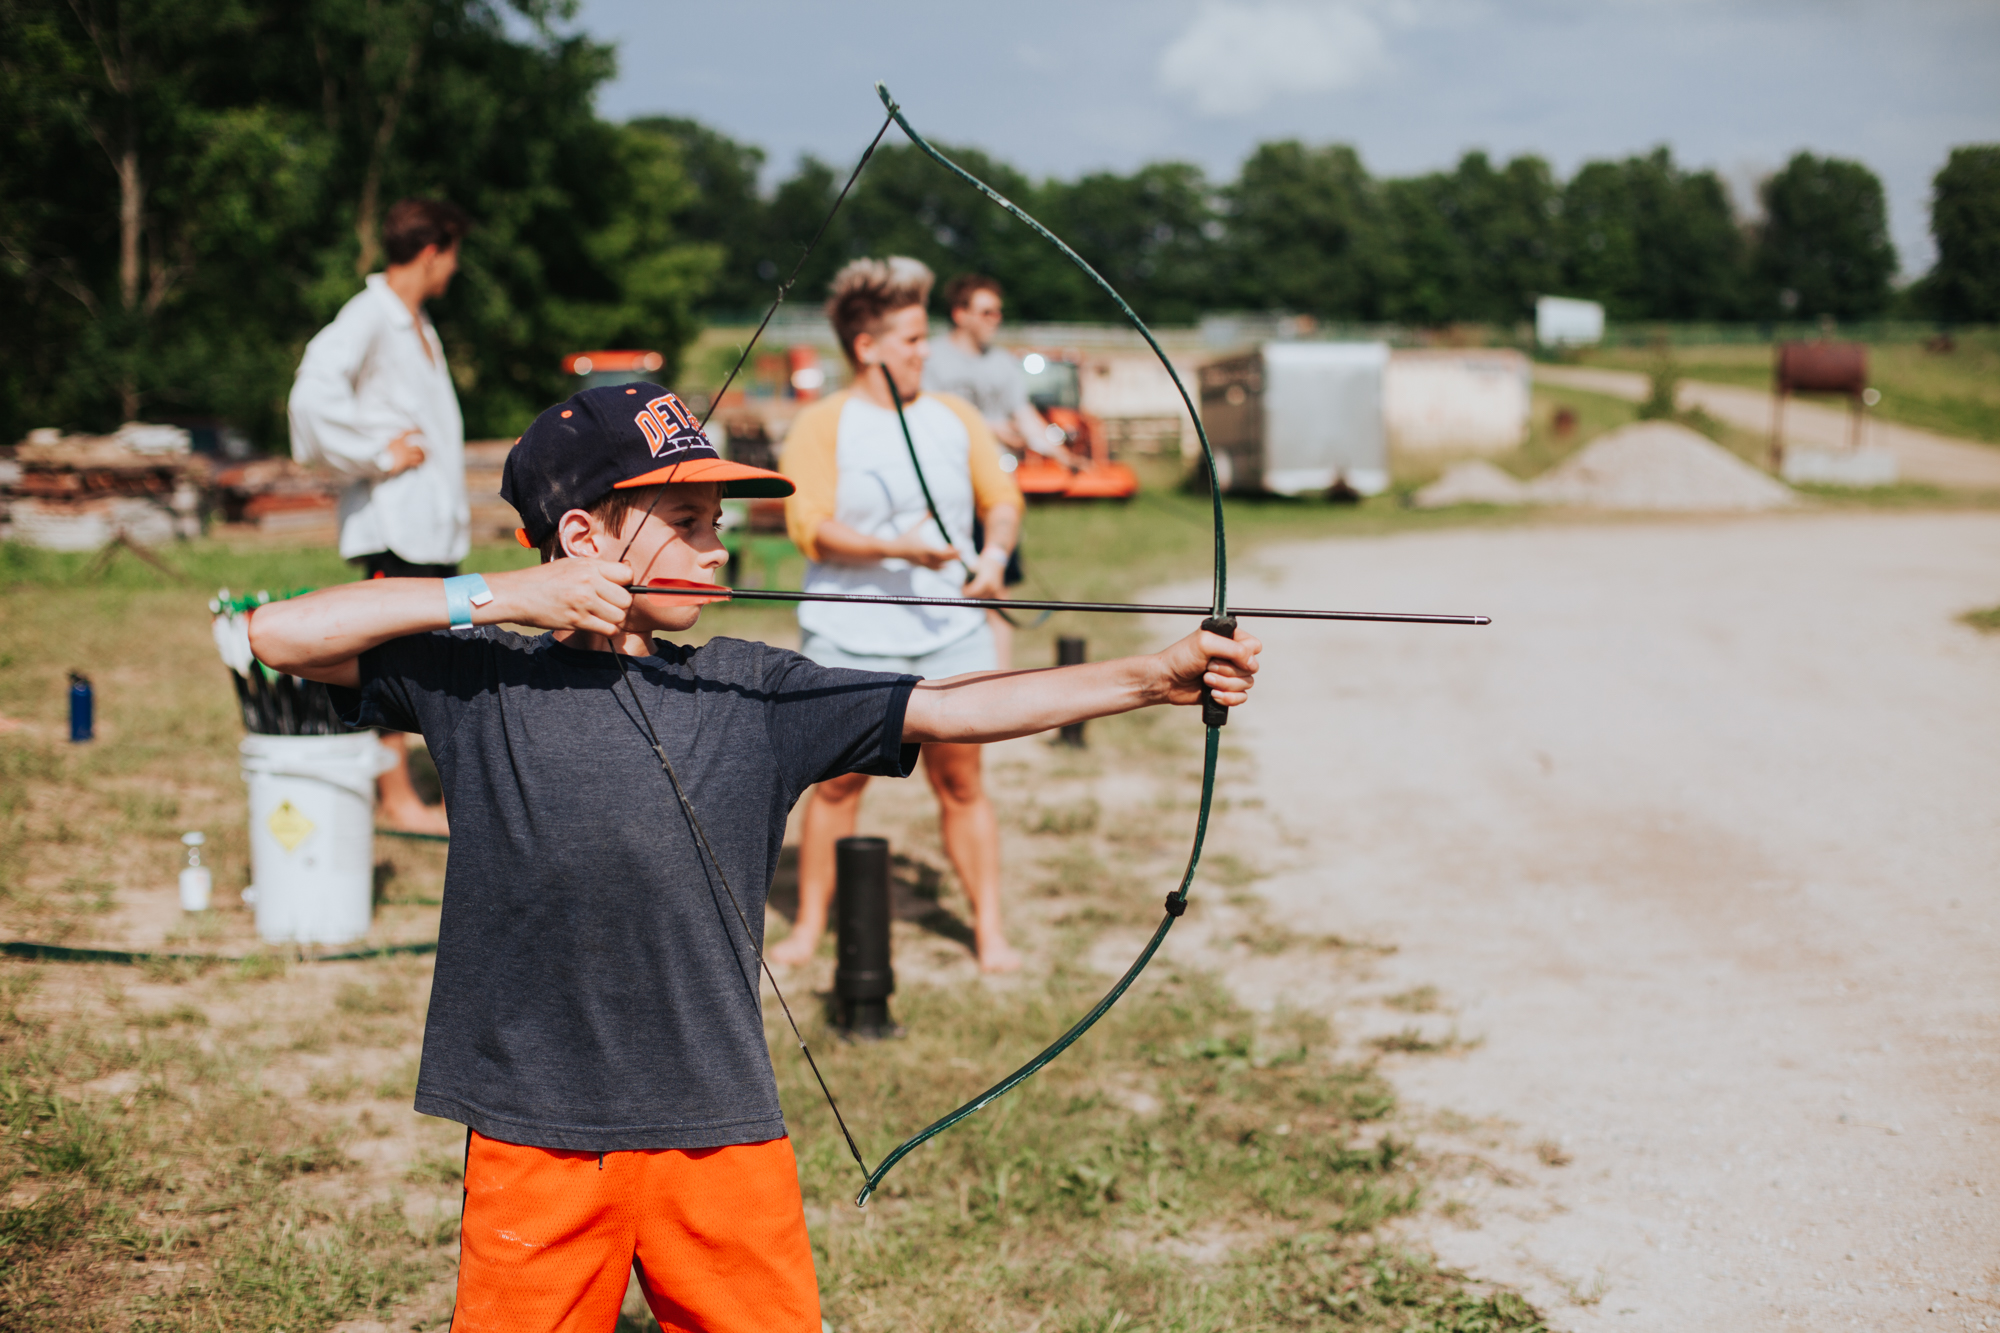 Kid Playing Archery